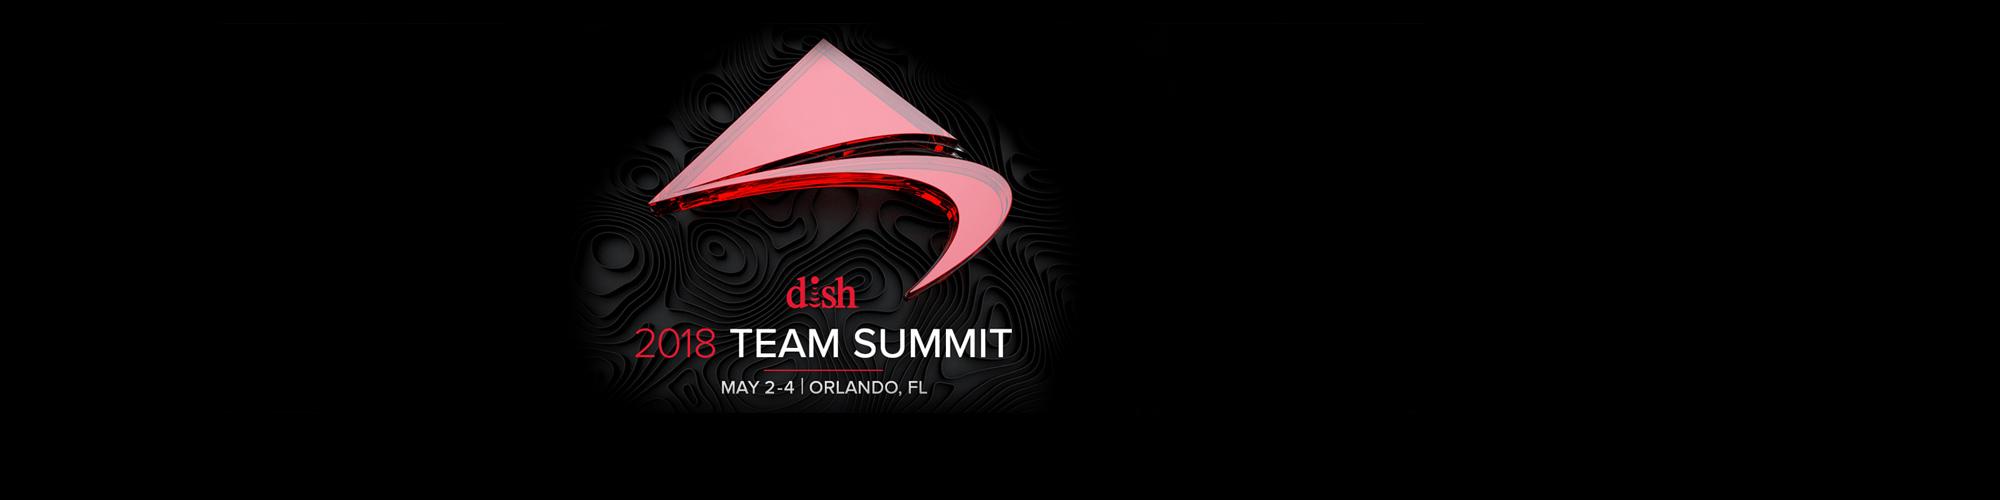 2018 Team Summit Levelok Booth 337